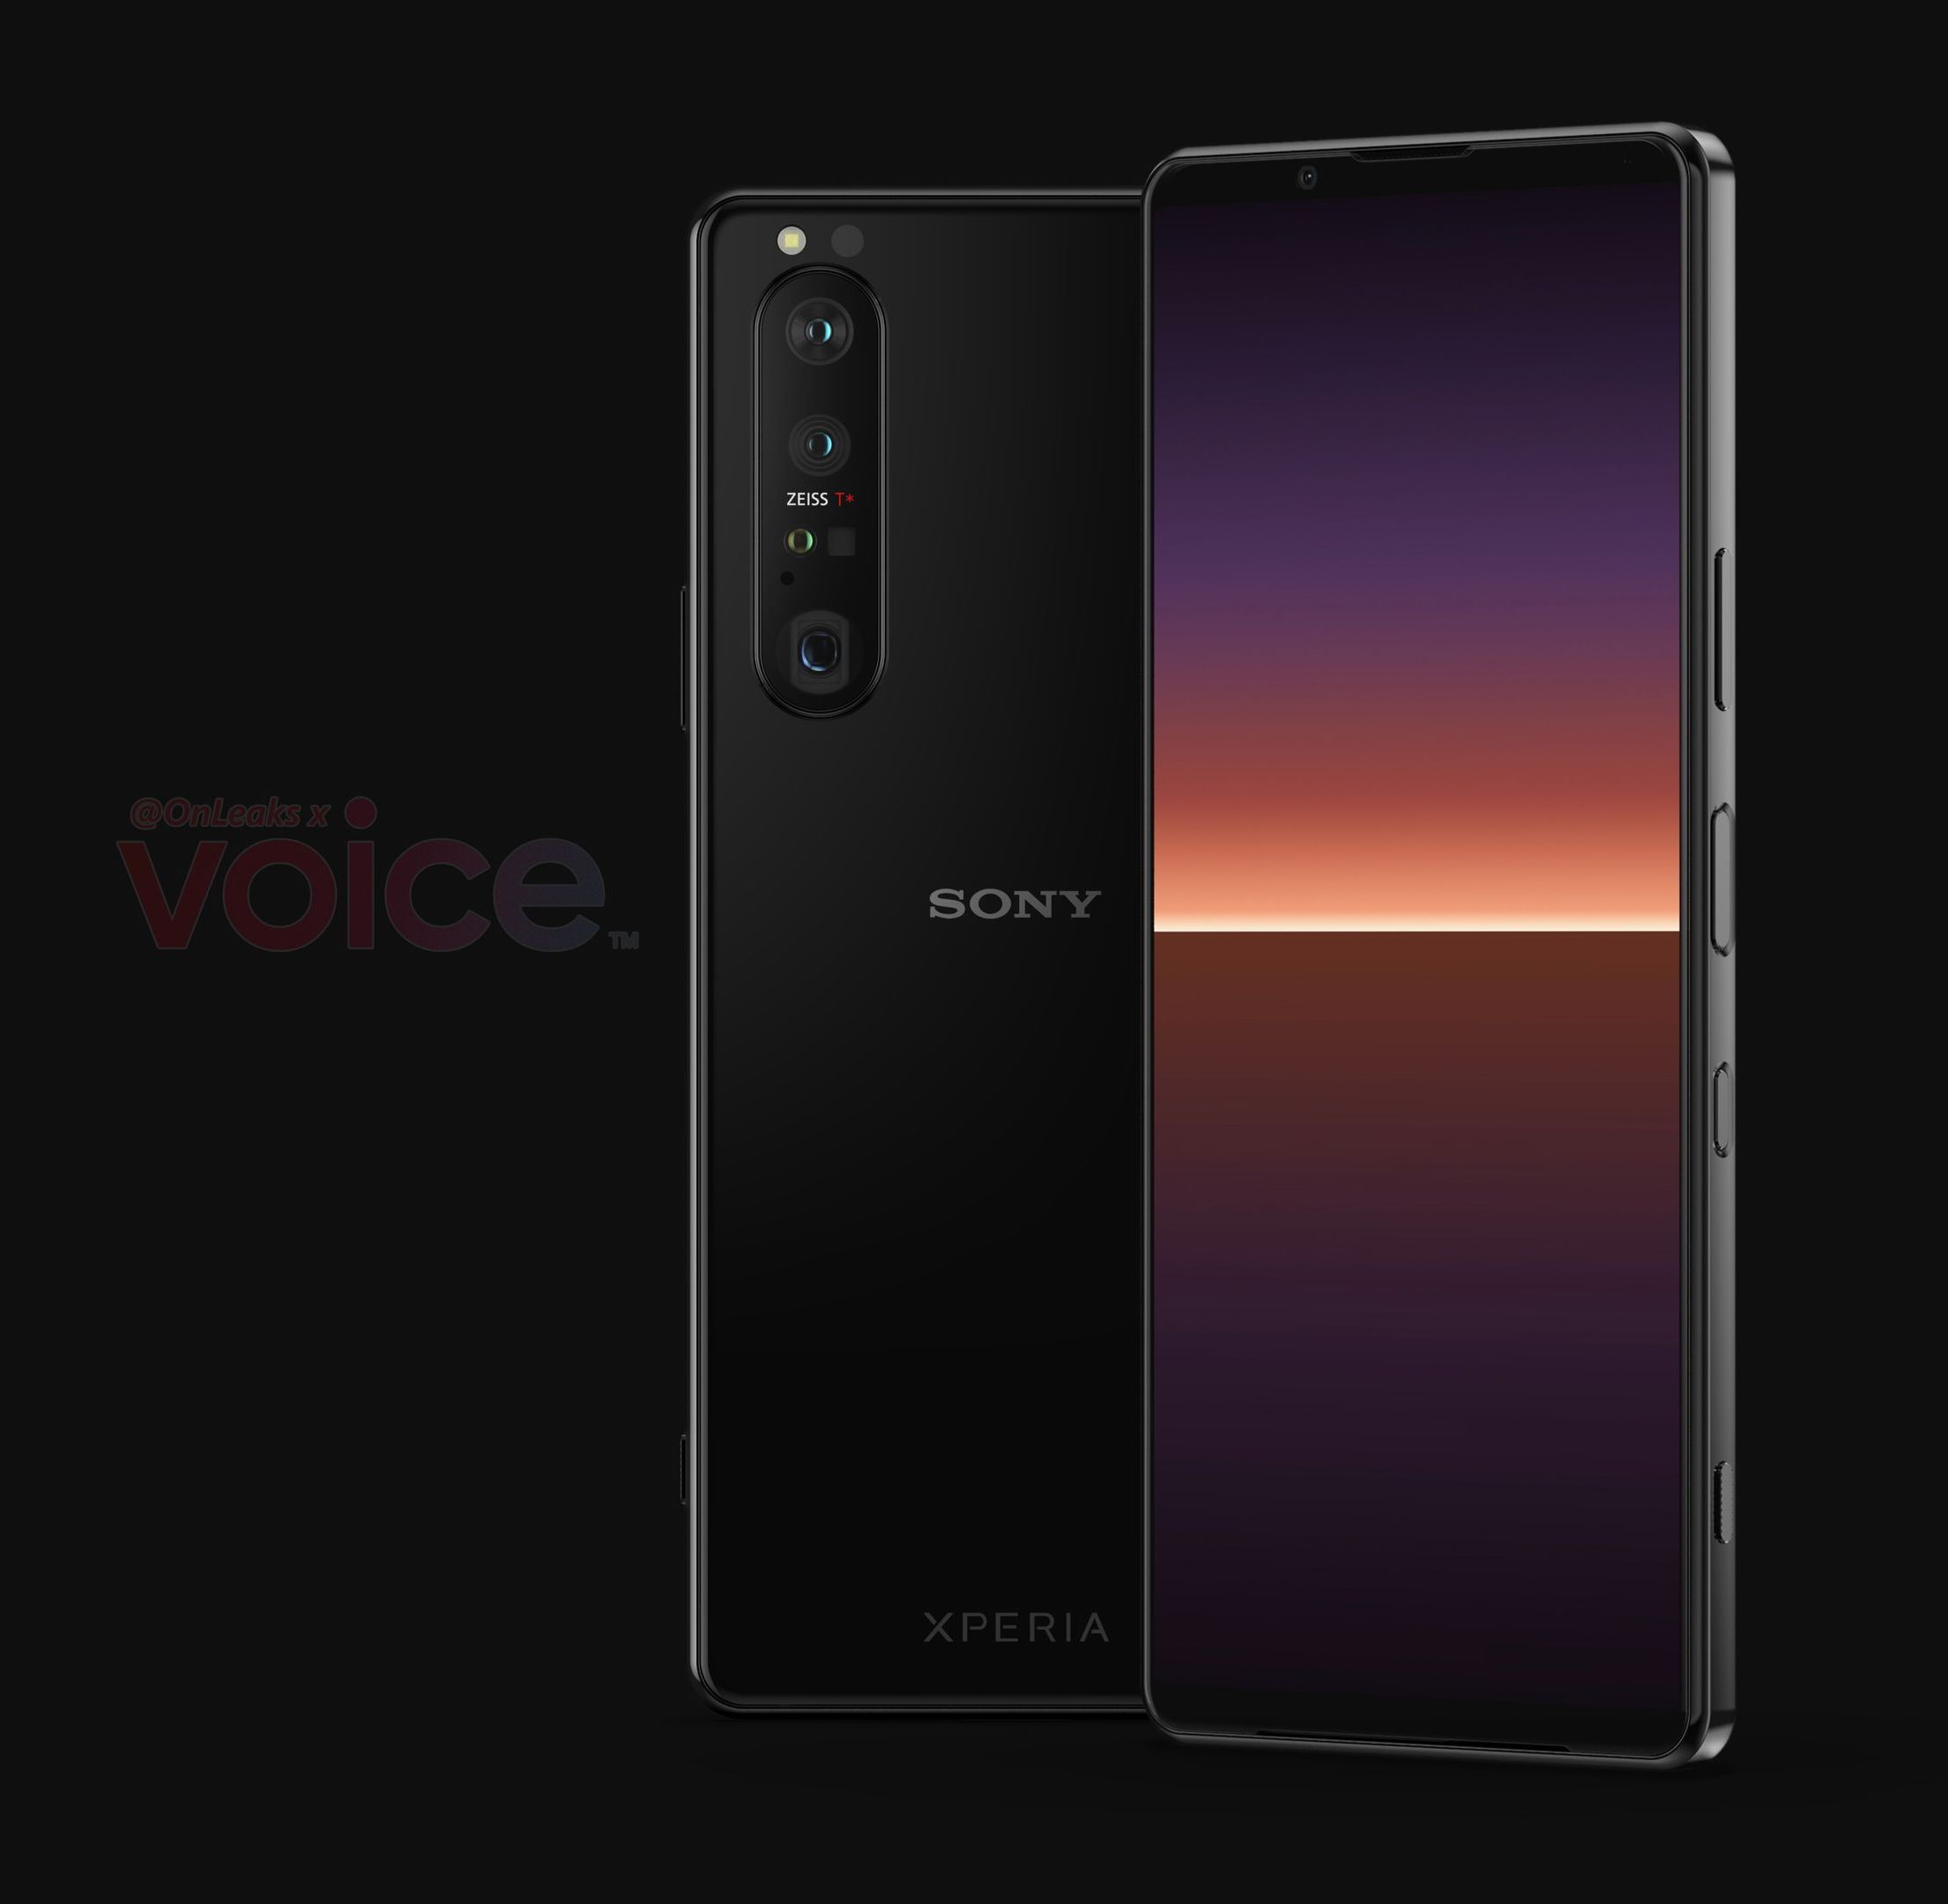 Sony Xperia 1 III:n mallinnos. Kuva: OnLeaks / Voice.